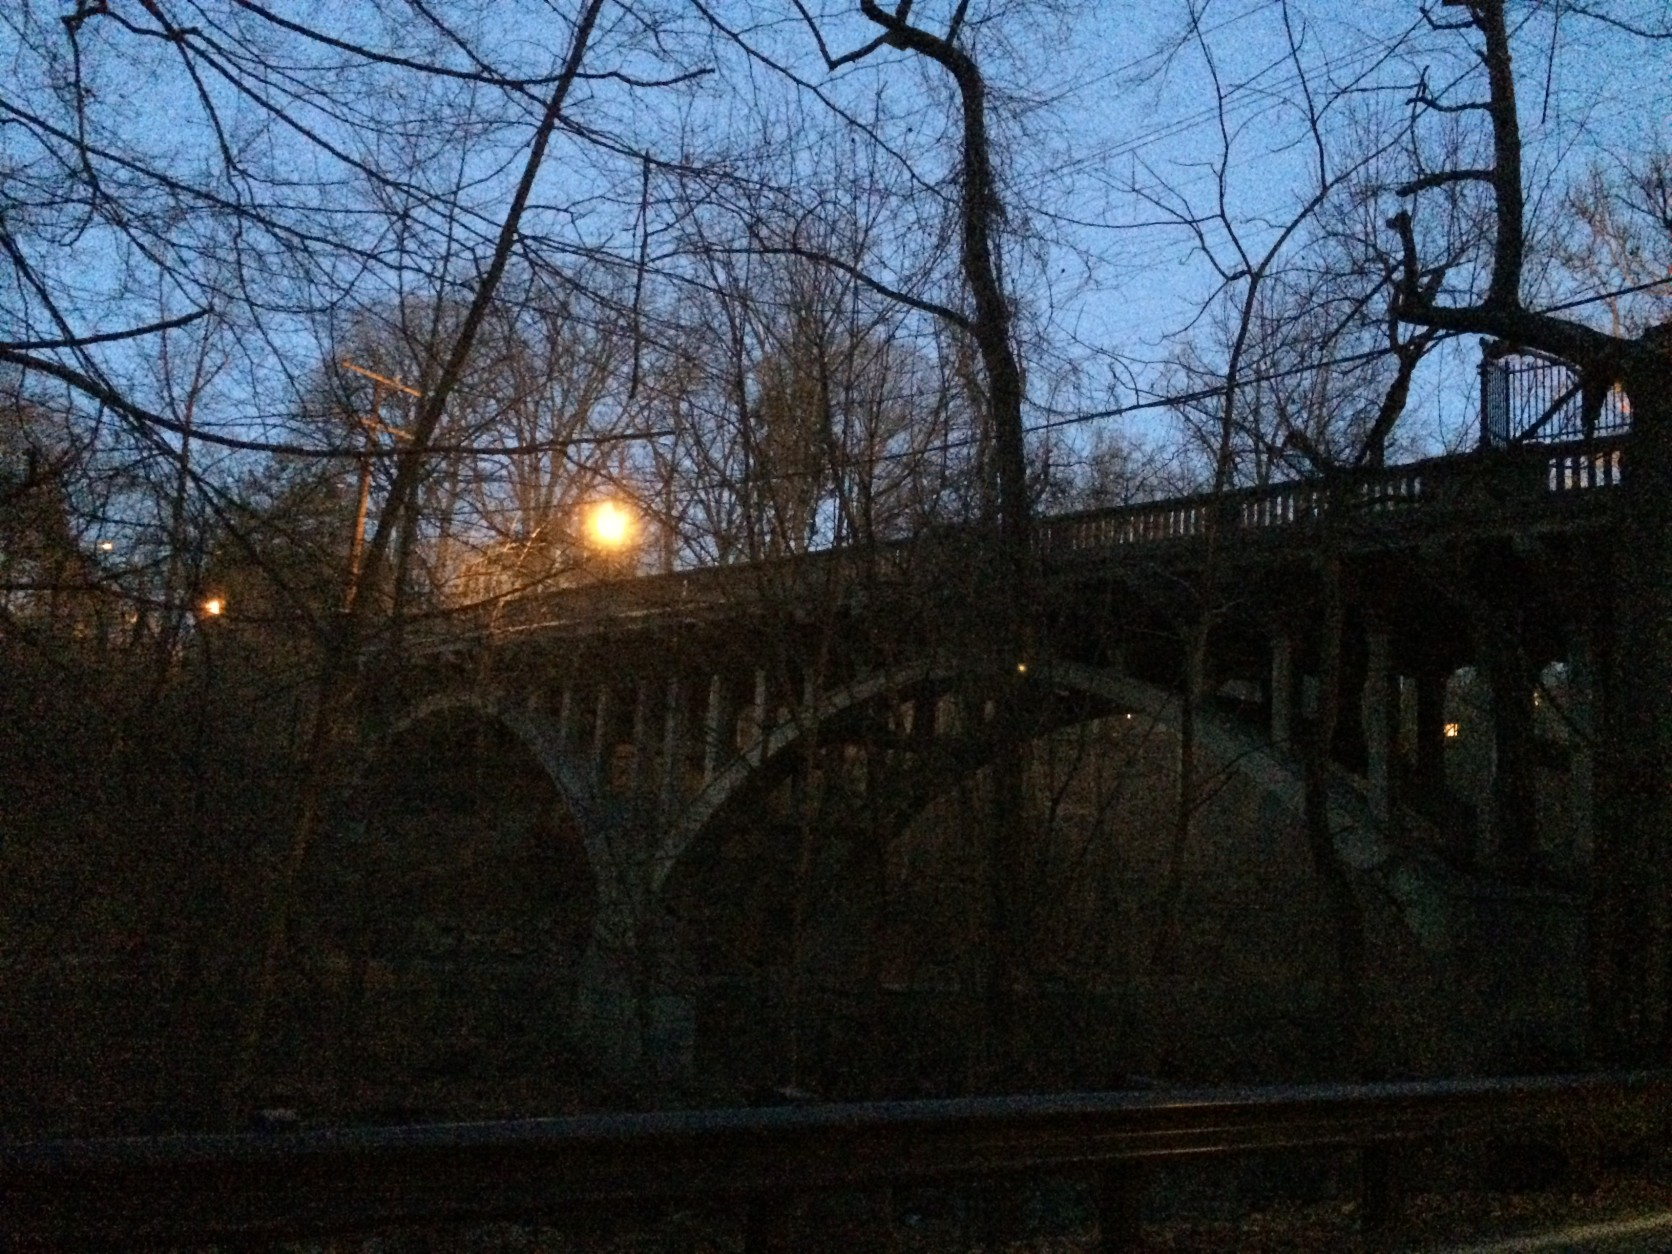 D.C. metro area home to 'structurally deficient' bridges